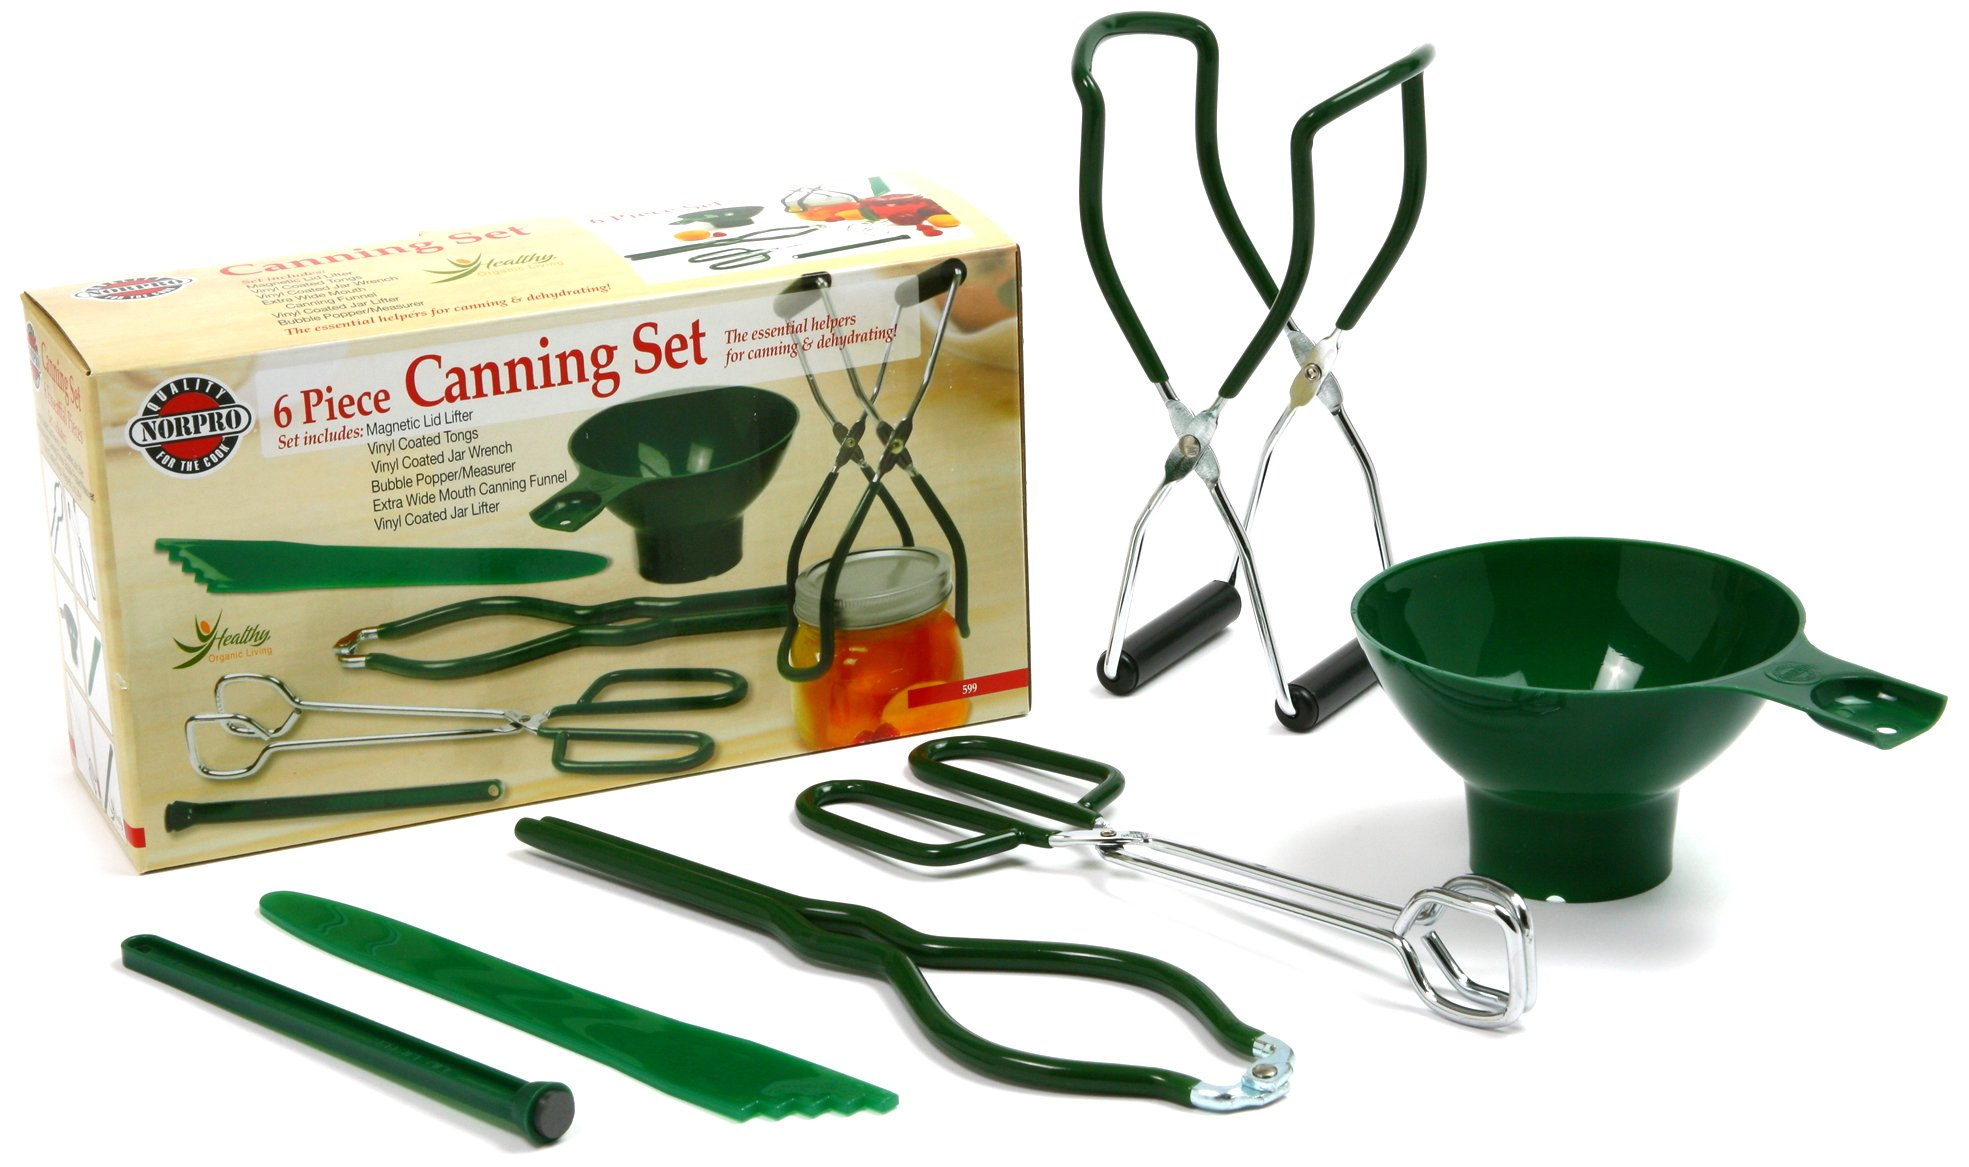 Norpro Canning Essentials Boxed Set, 6 Piece Set by Norpro